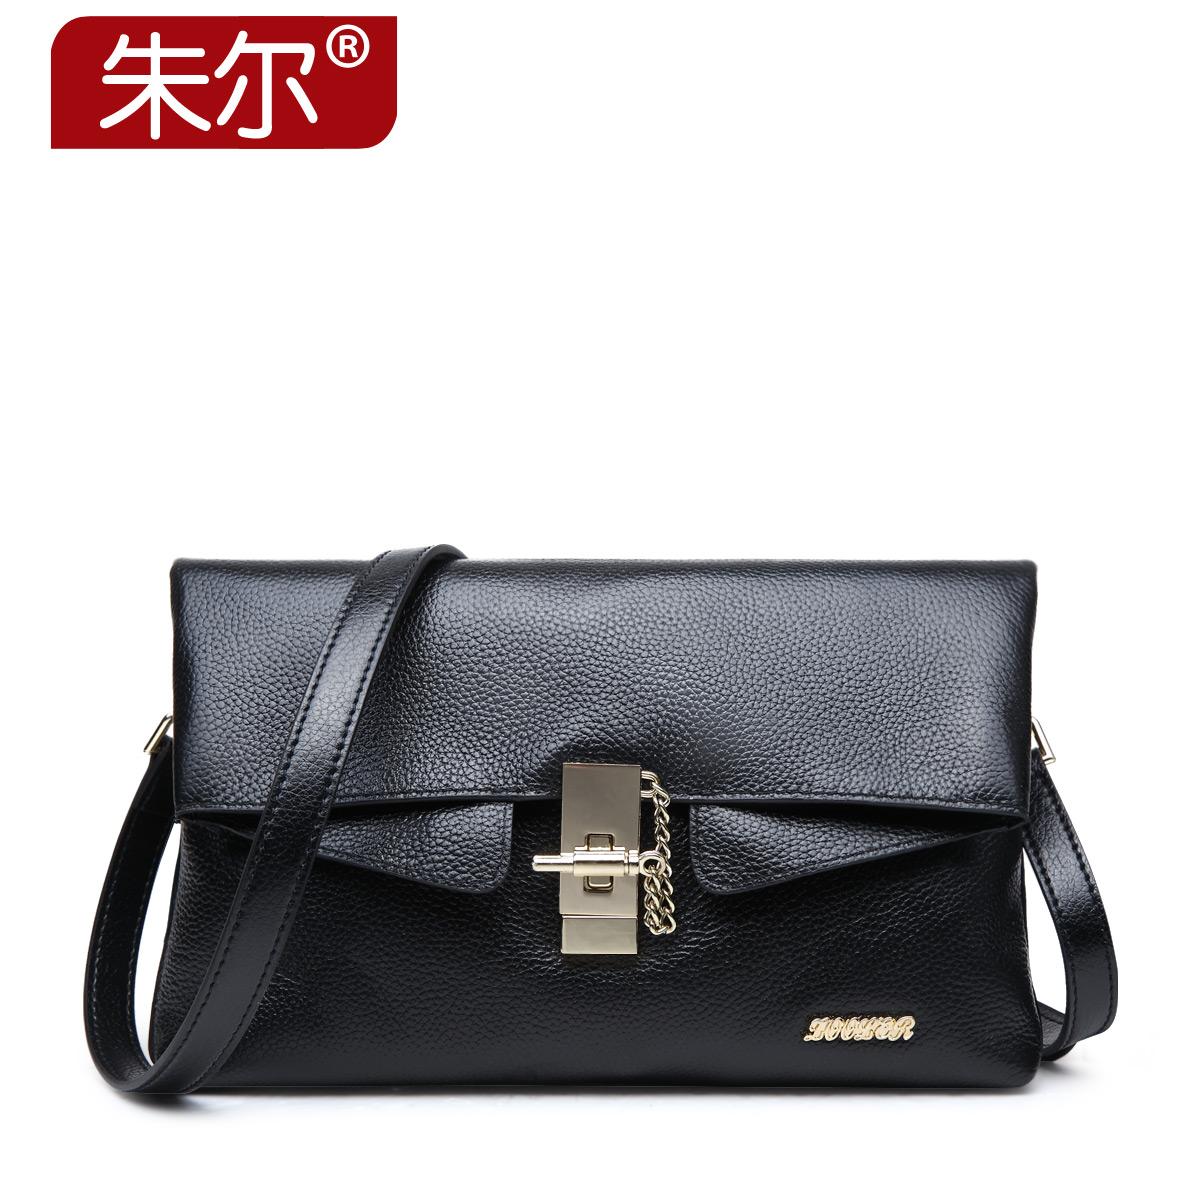 2015 Autumn genuine leather women's handbag clutch fashion ladies bags cowhide messenger bag female